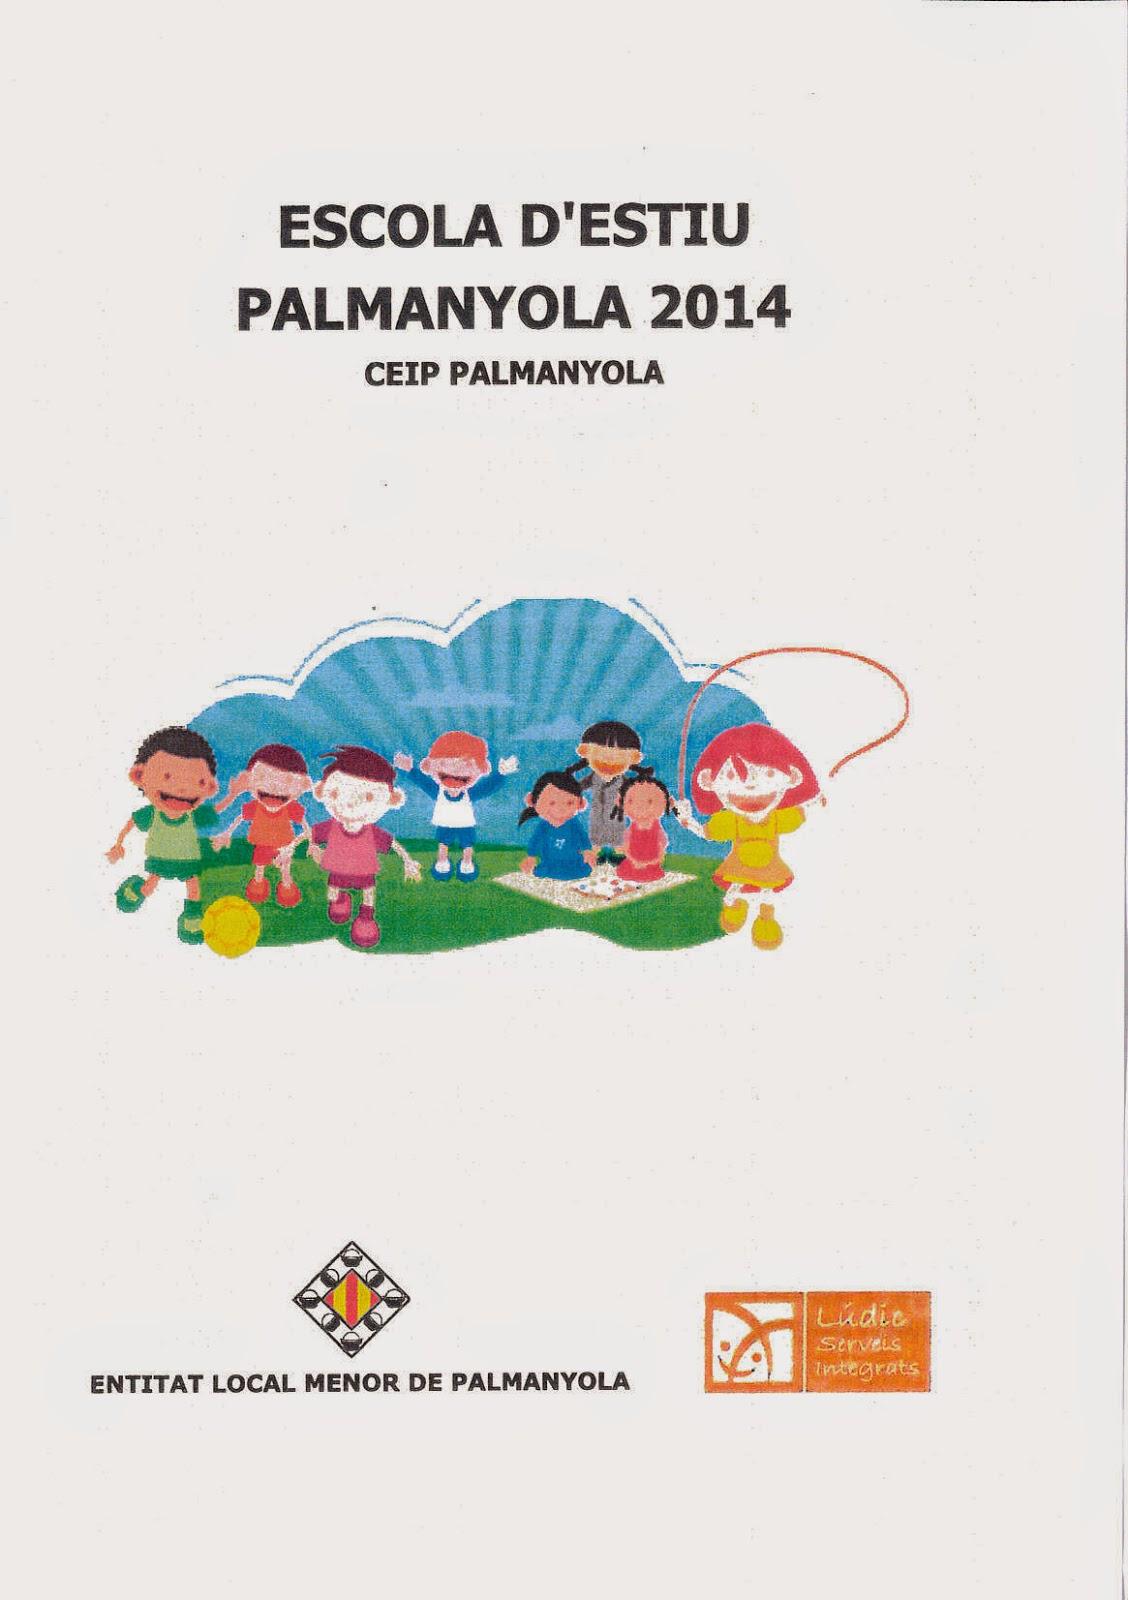 http://www.cpgasparsabater.org/curs%2013-14/escola%20d%27estiu.pdf